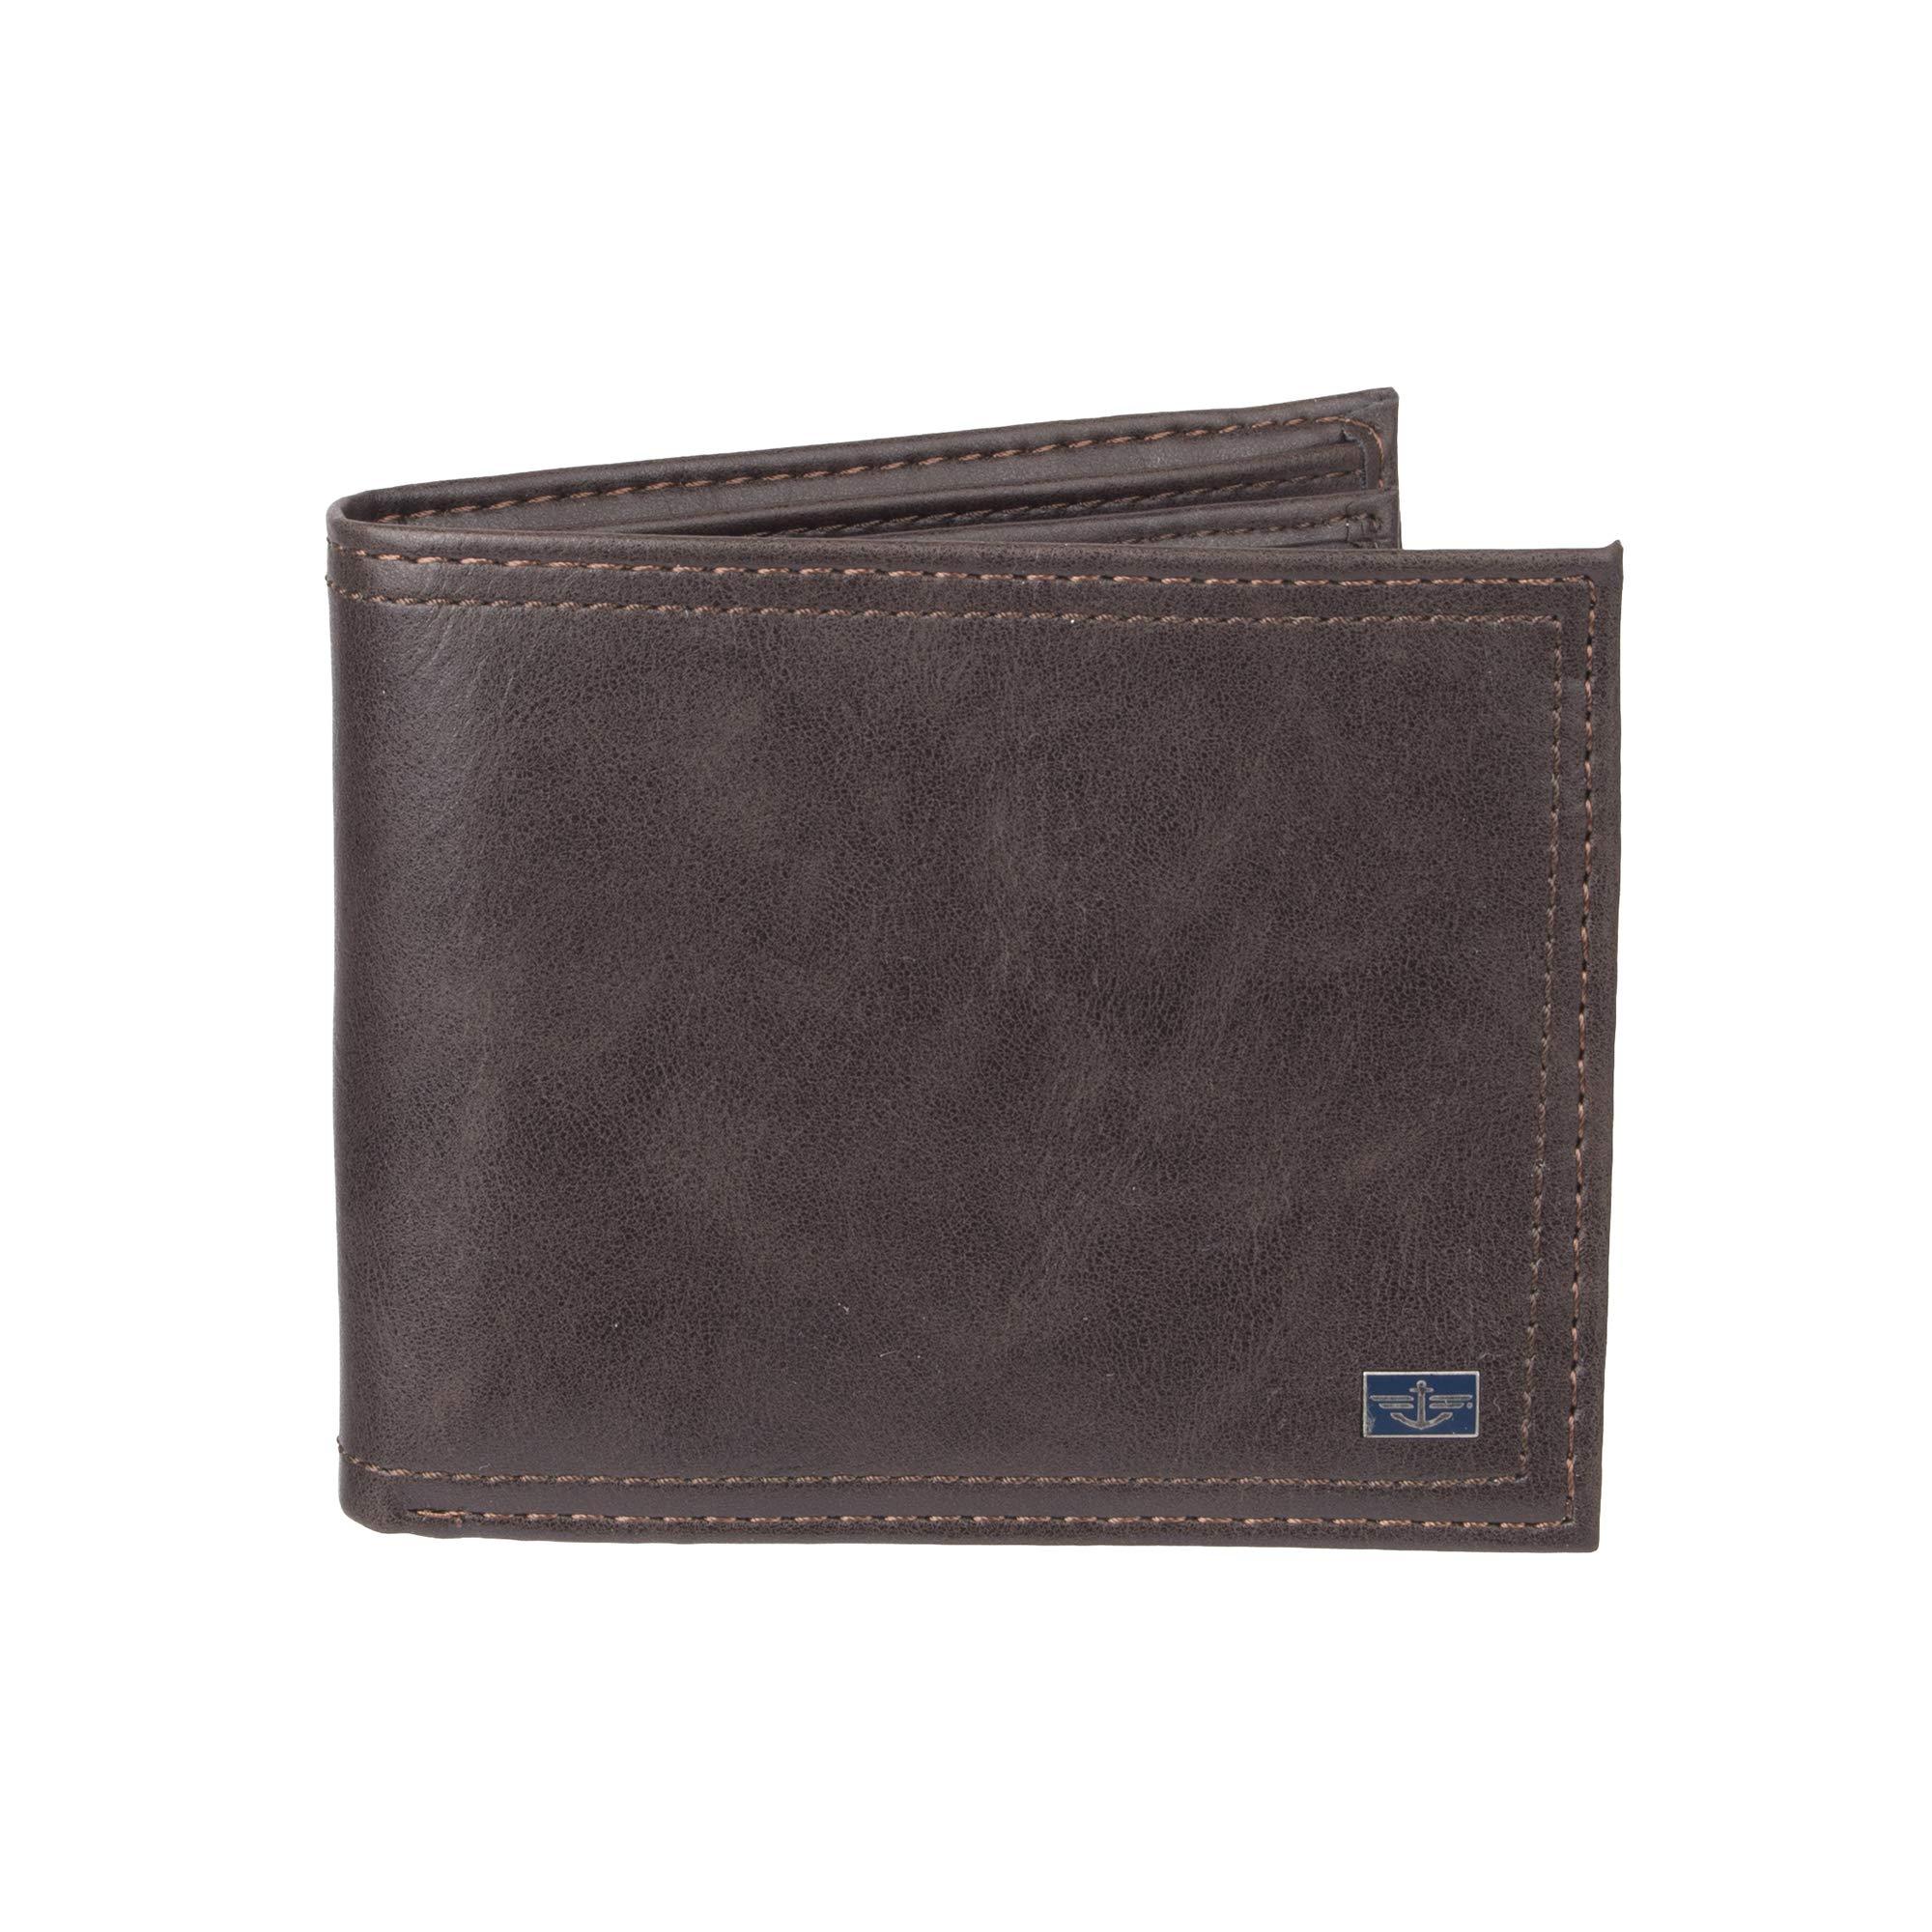 Columbia Mens RFID Security Blocking Extra-Capacity Slimfold Wallet